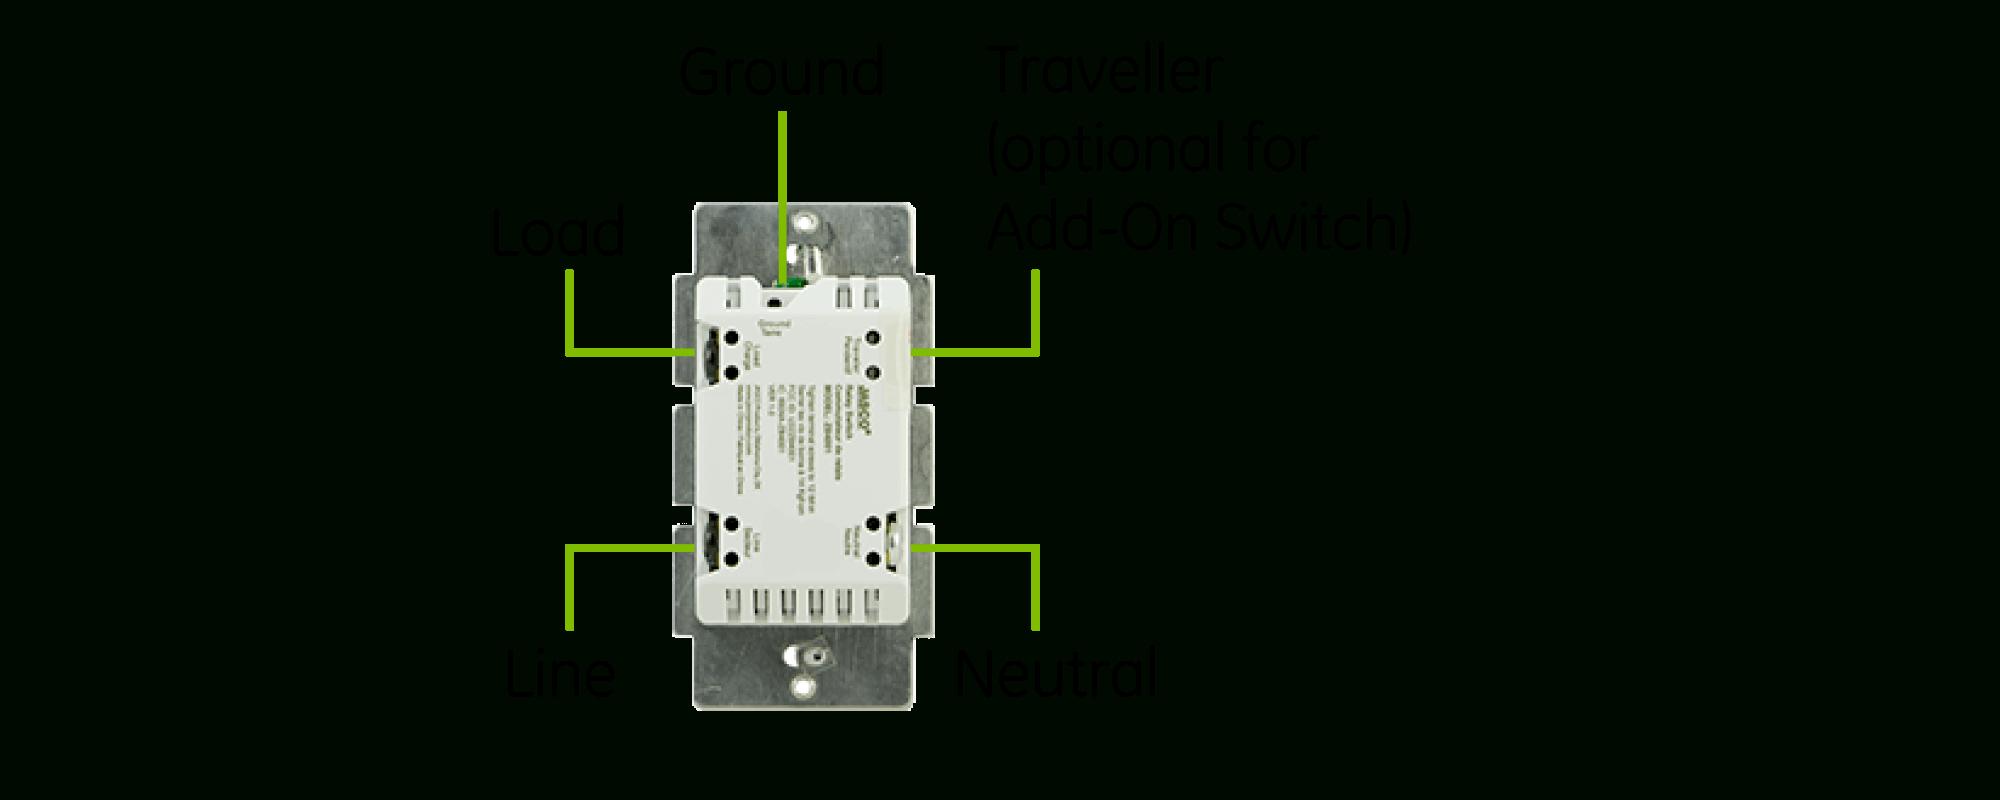 Ge Z Wave 3 Way Switch Wiring Diagram   Wiring Diagram - Ge Z Wave 3 Way Switch Wiring Diagram